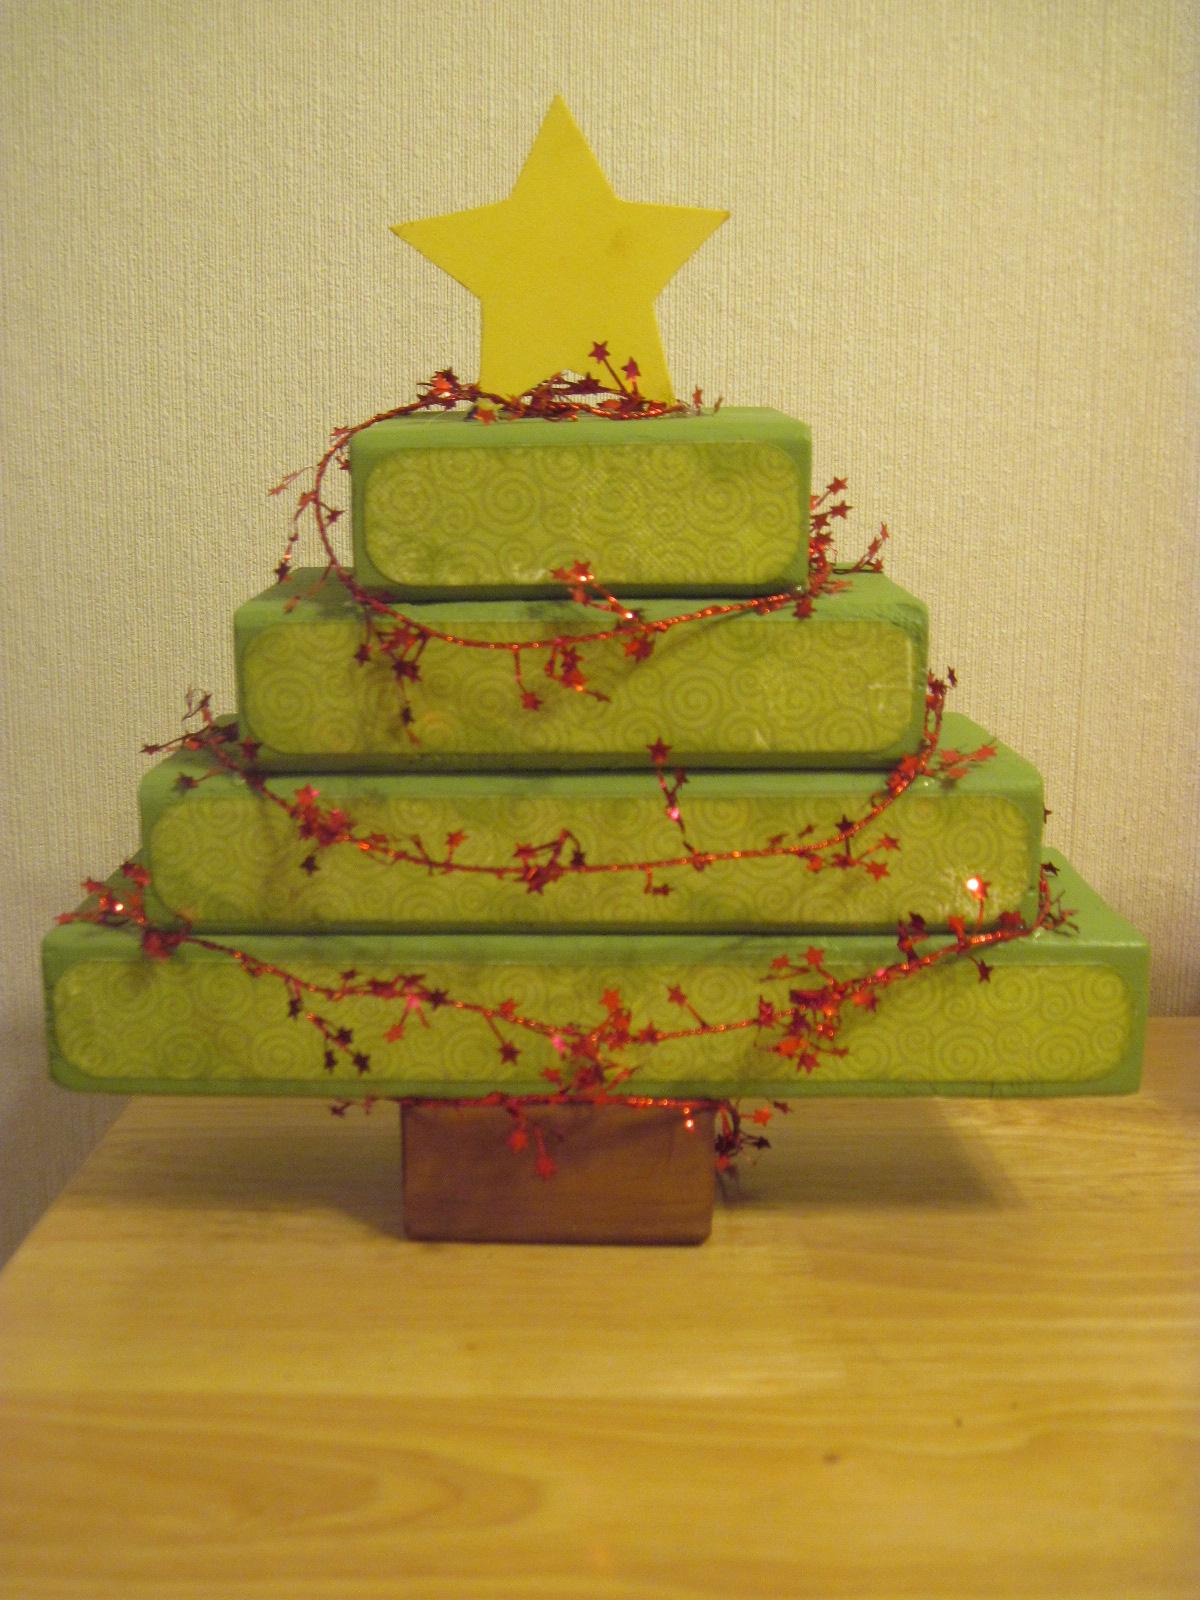 Crafts I Tried 2x4 Pumpkin And Christmas Tree